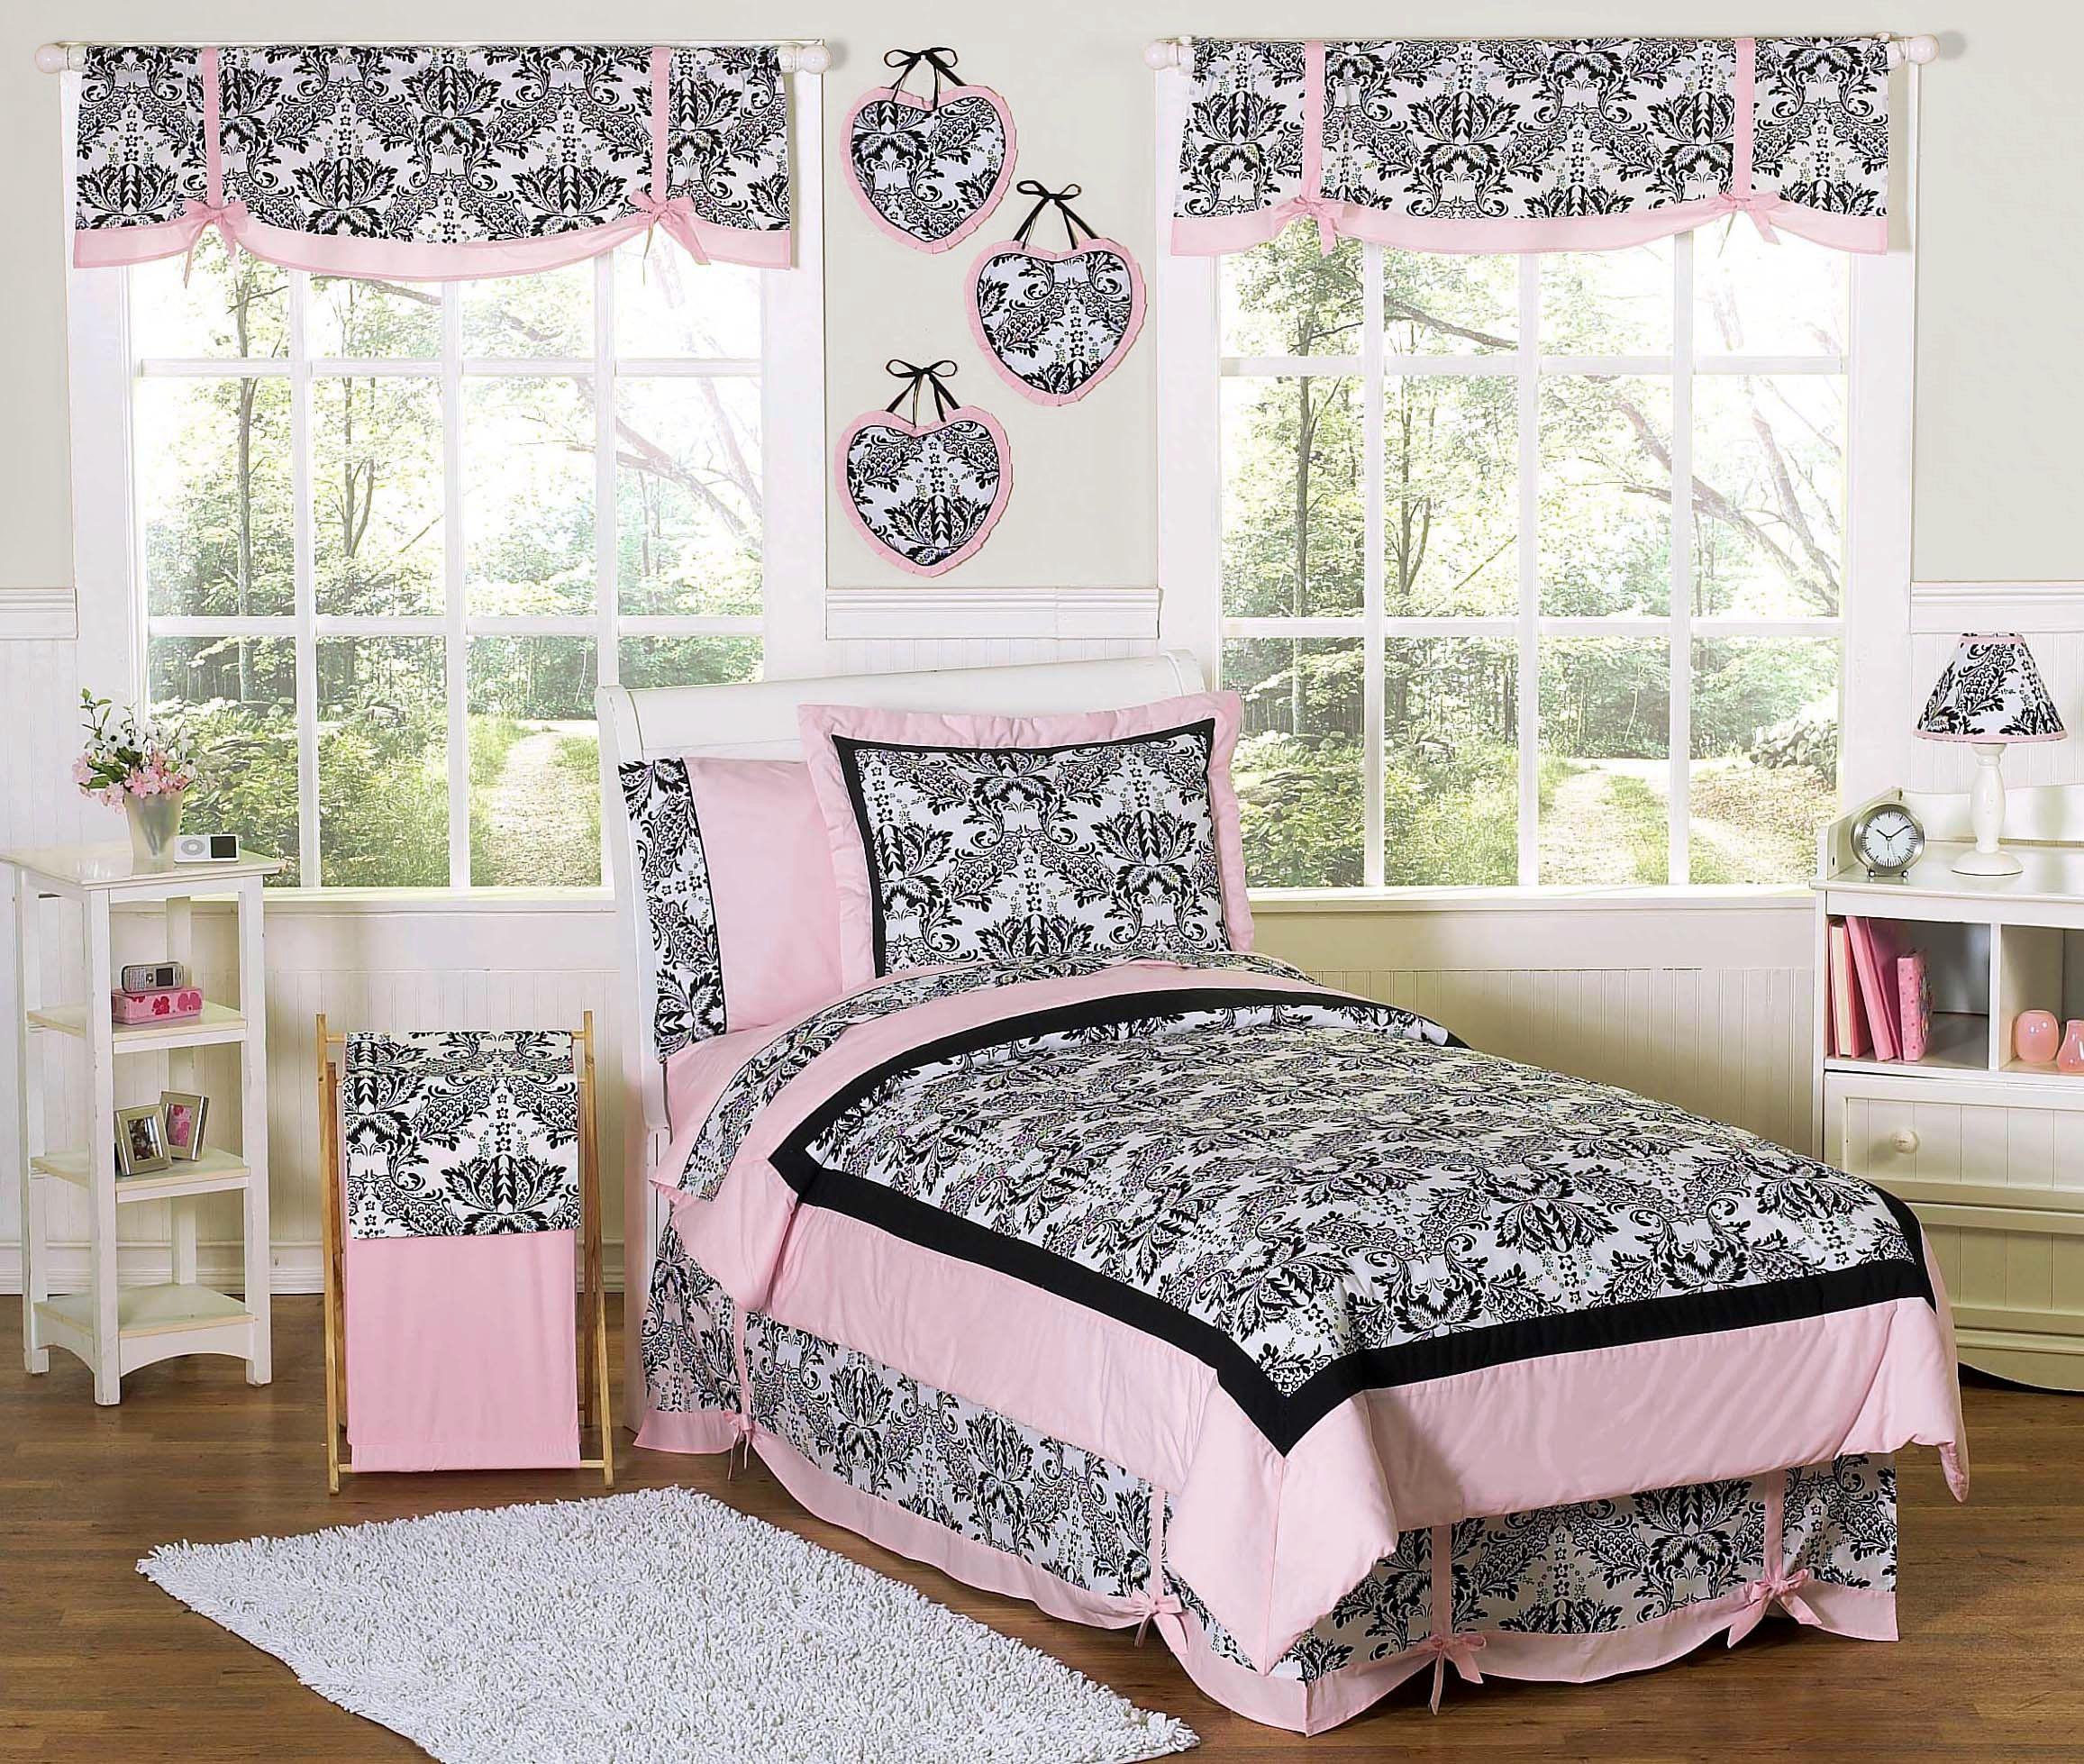 Jojo luxury black white damask girl kids teen full queen sized bedding - Pink Black French Style Bedding Twin Full Queen Comforter Sets For Girls Sophia Teen Beddinggirls Bedding Setsdamask